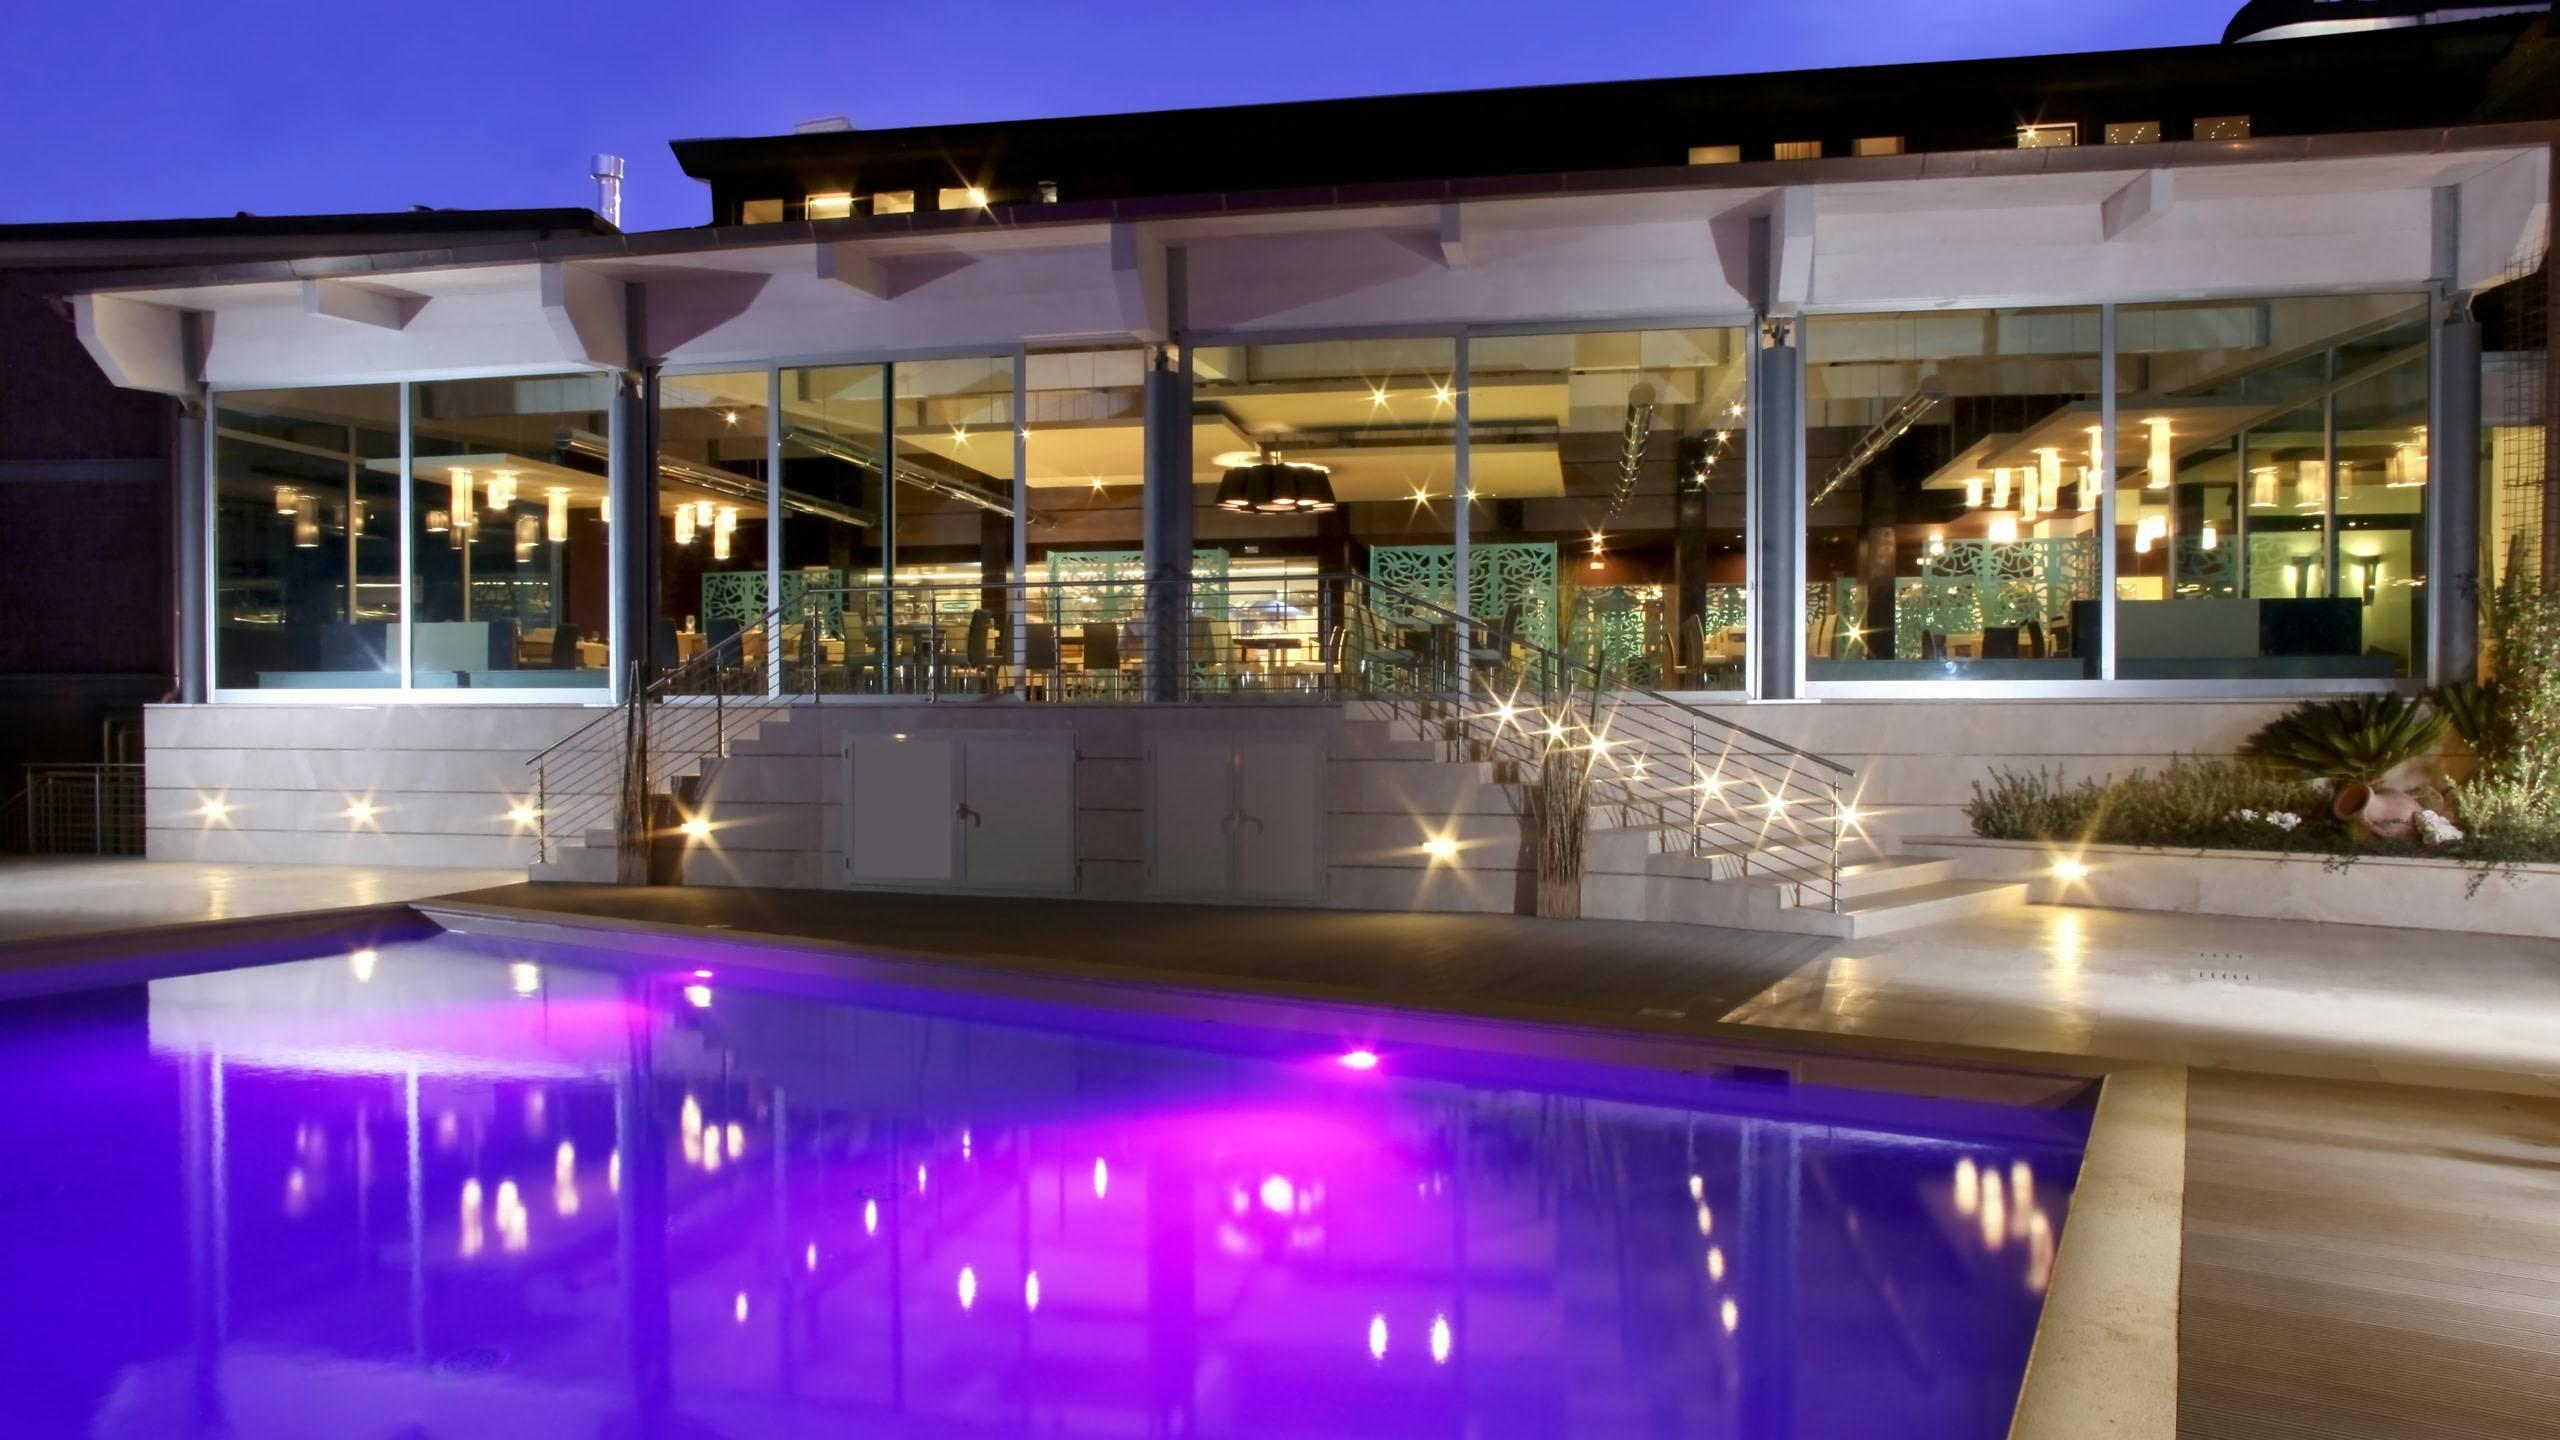 villamercede-piscina-40